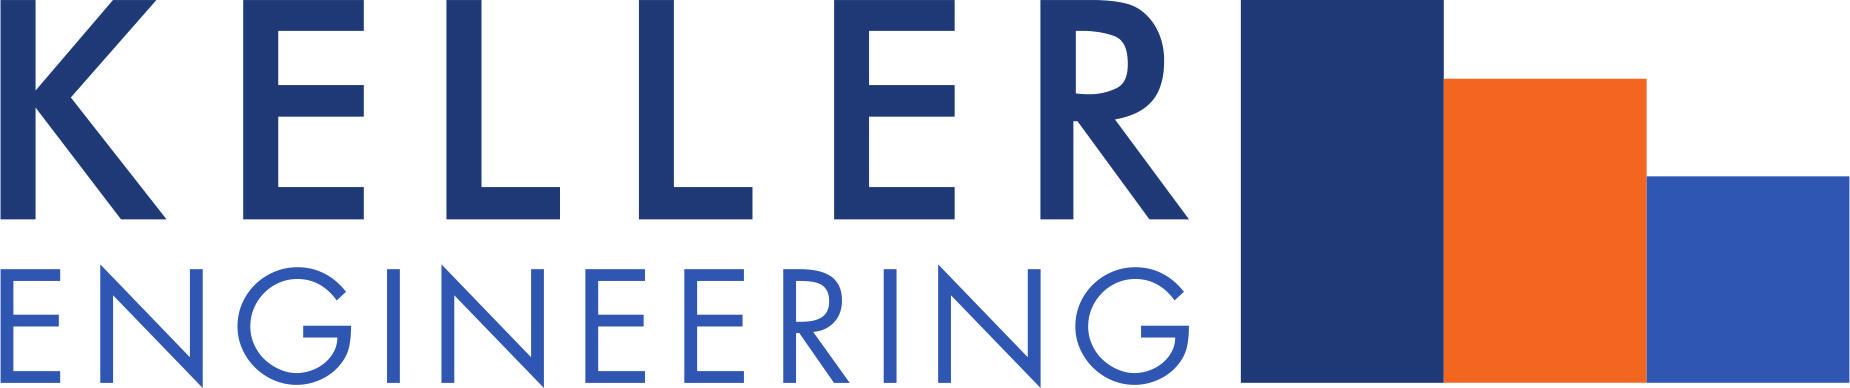 Keller Engineering Logo